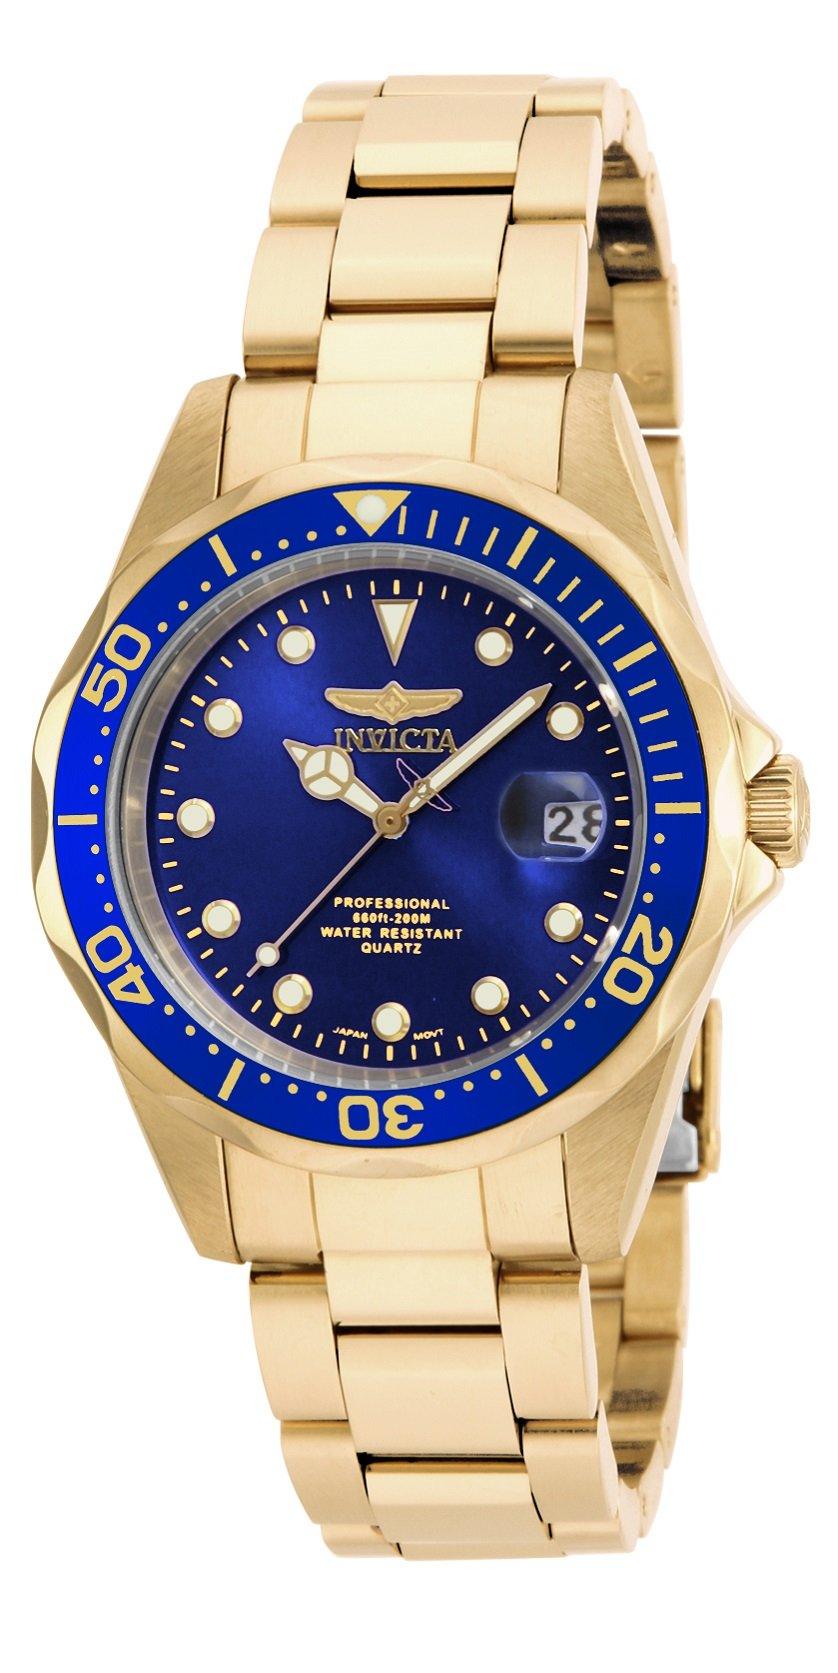 Invicta Women's 17052 Pro Diver Analog Display Japanese Quartz Gold Watch by Invicta